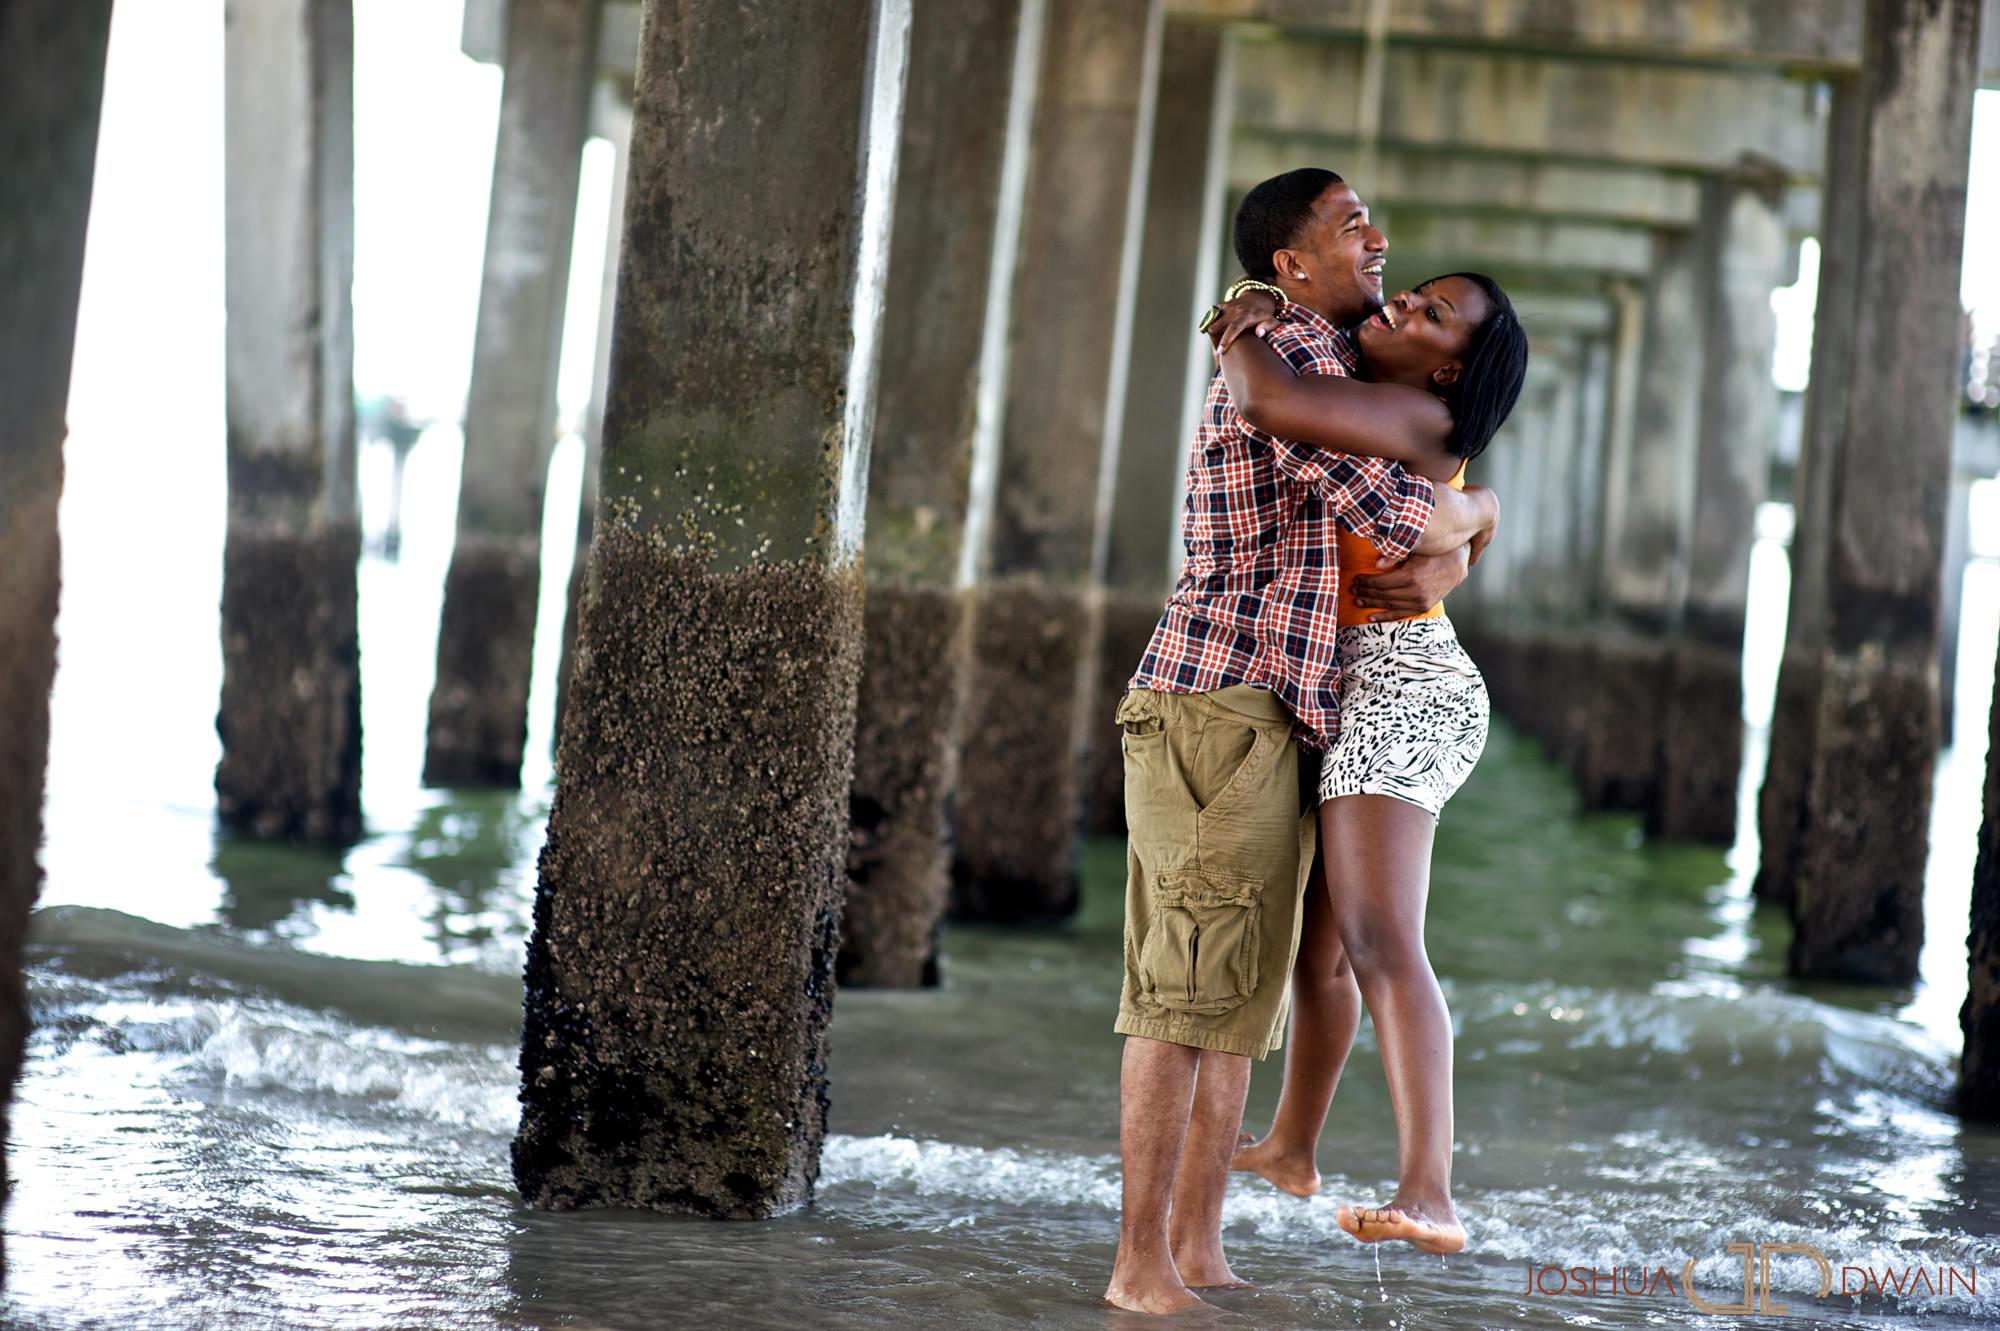 lucette-stephen-007-coney-island-brooklyn-ny-engagement-photographer-joshua-dwain-2011-07-02_ls_054